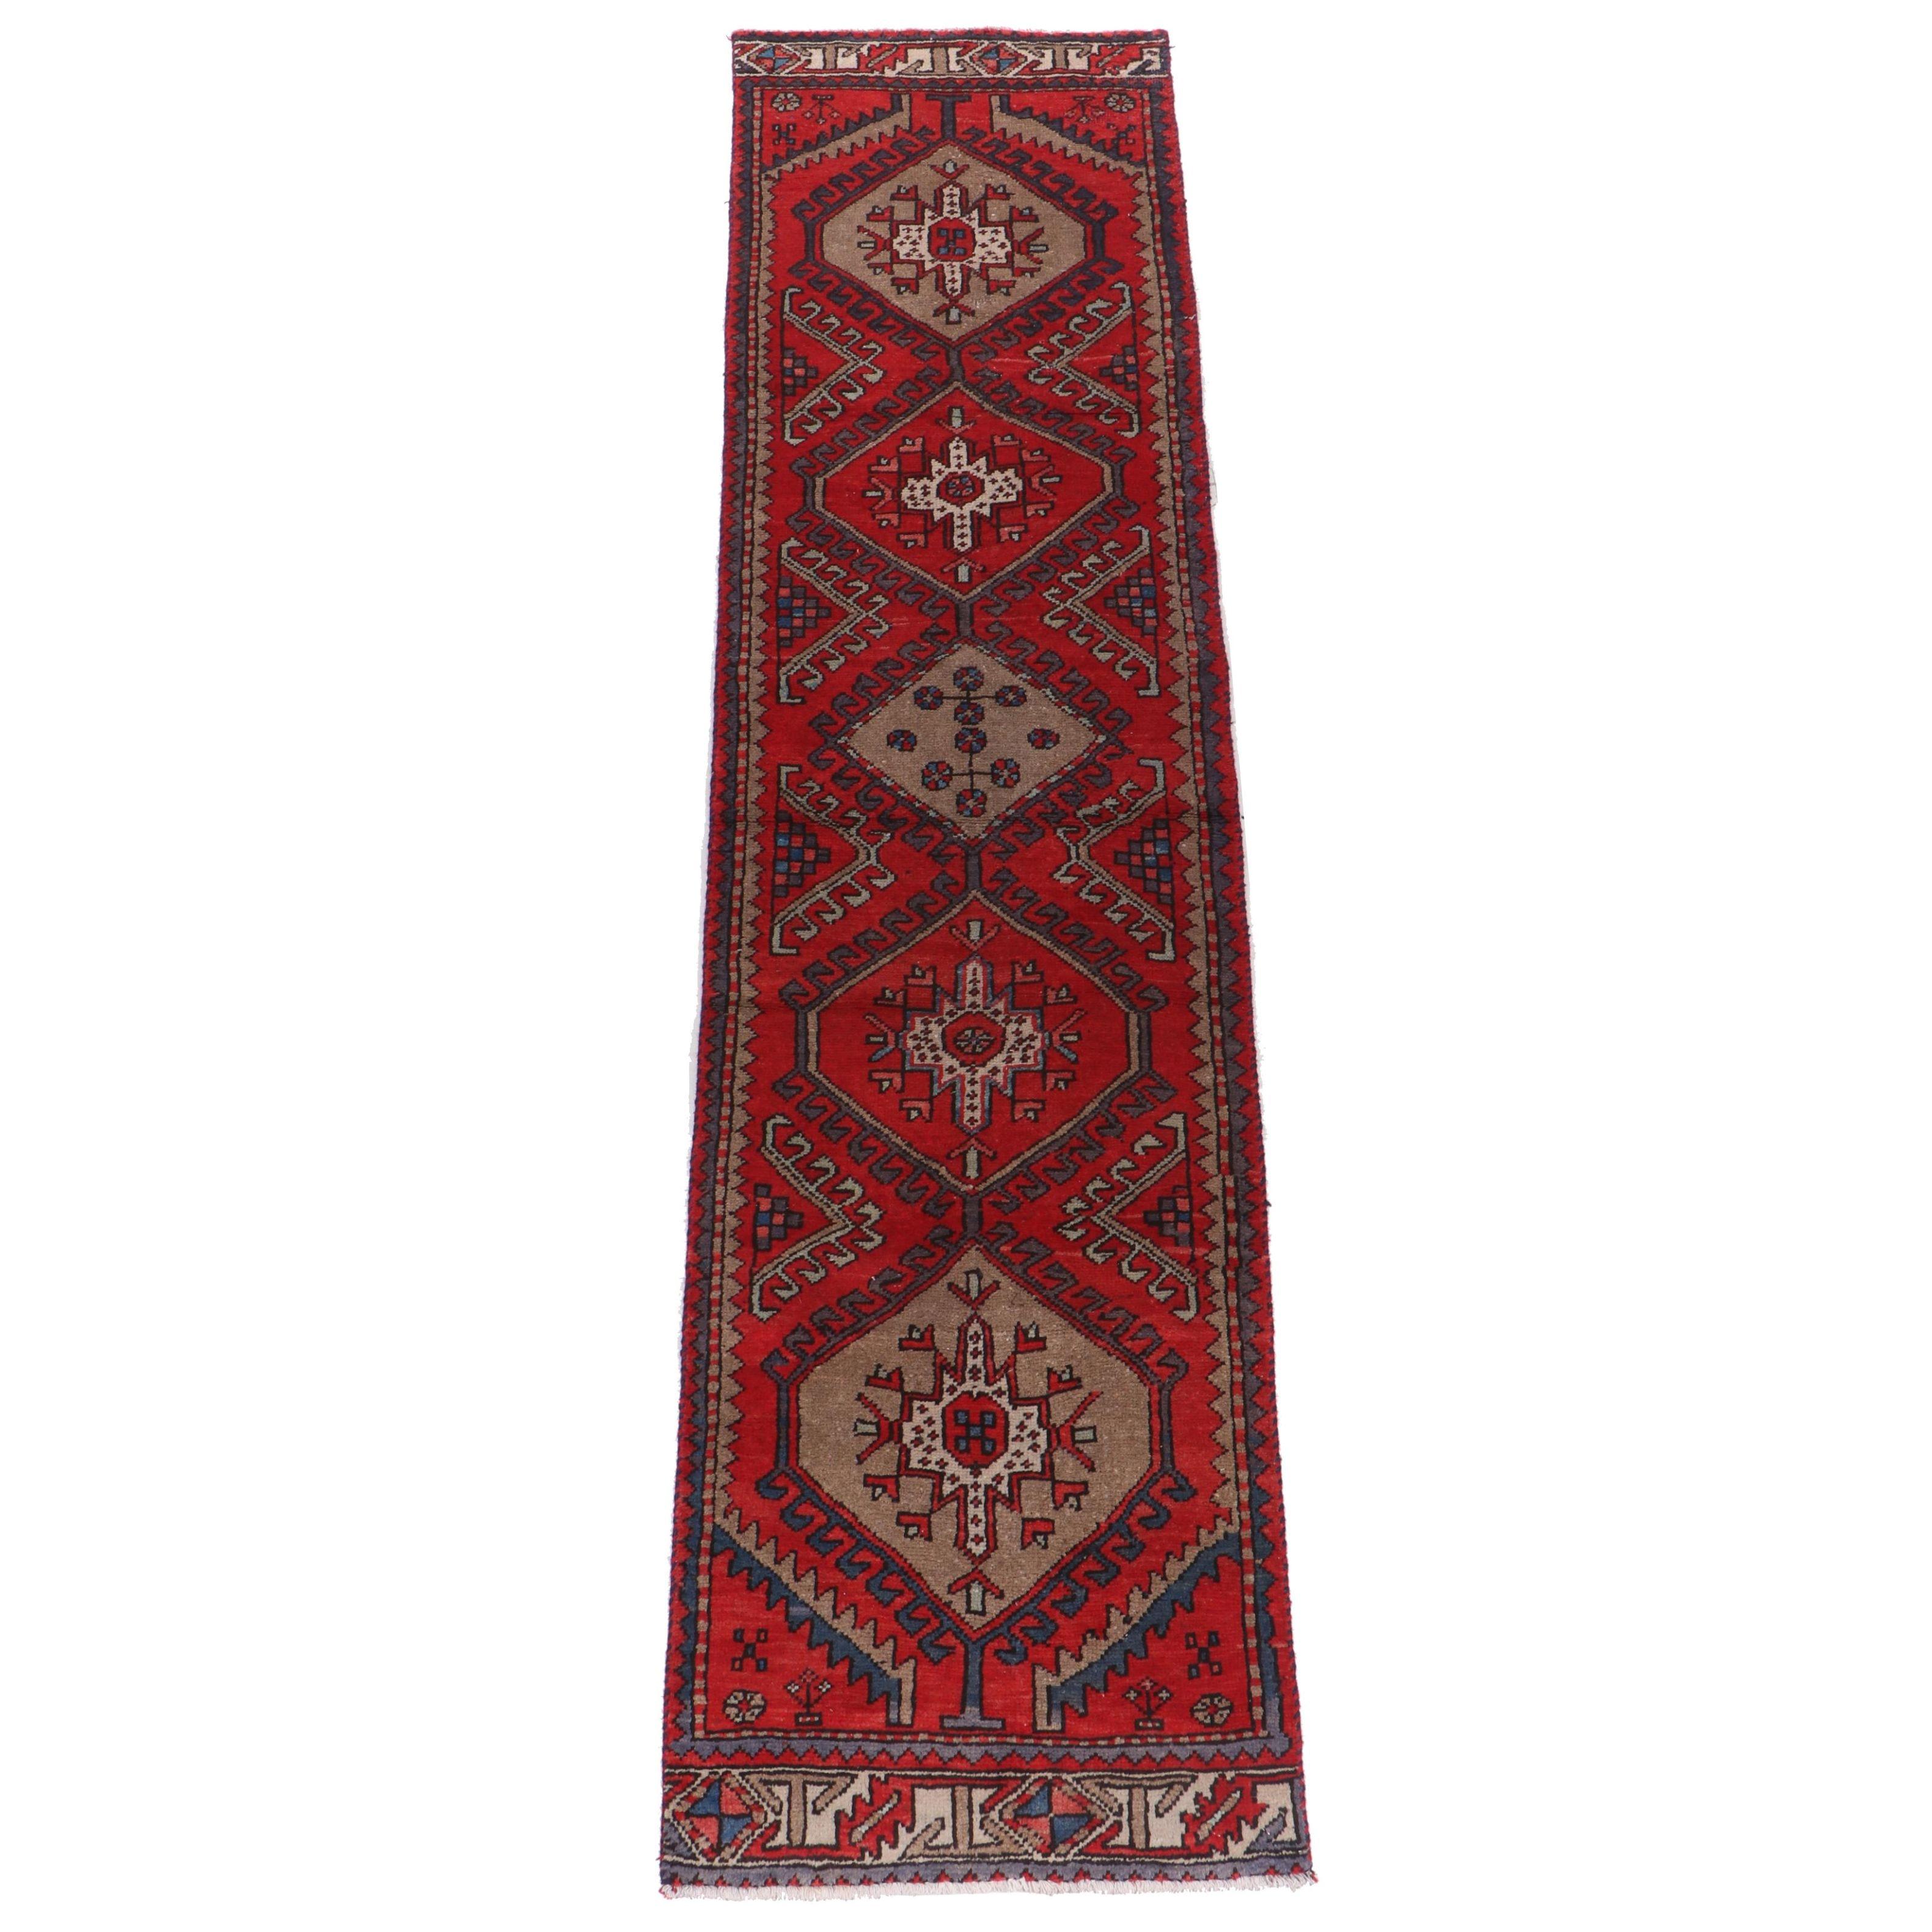 Hand-Knotted Kazak Wool Carpet Runner